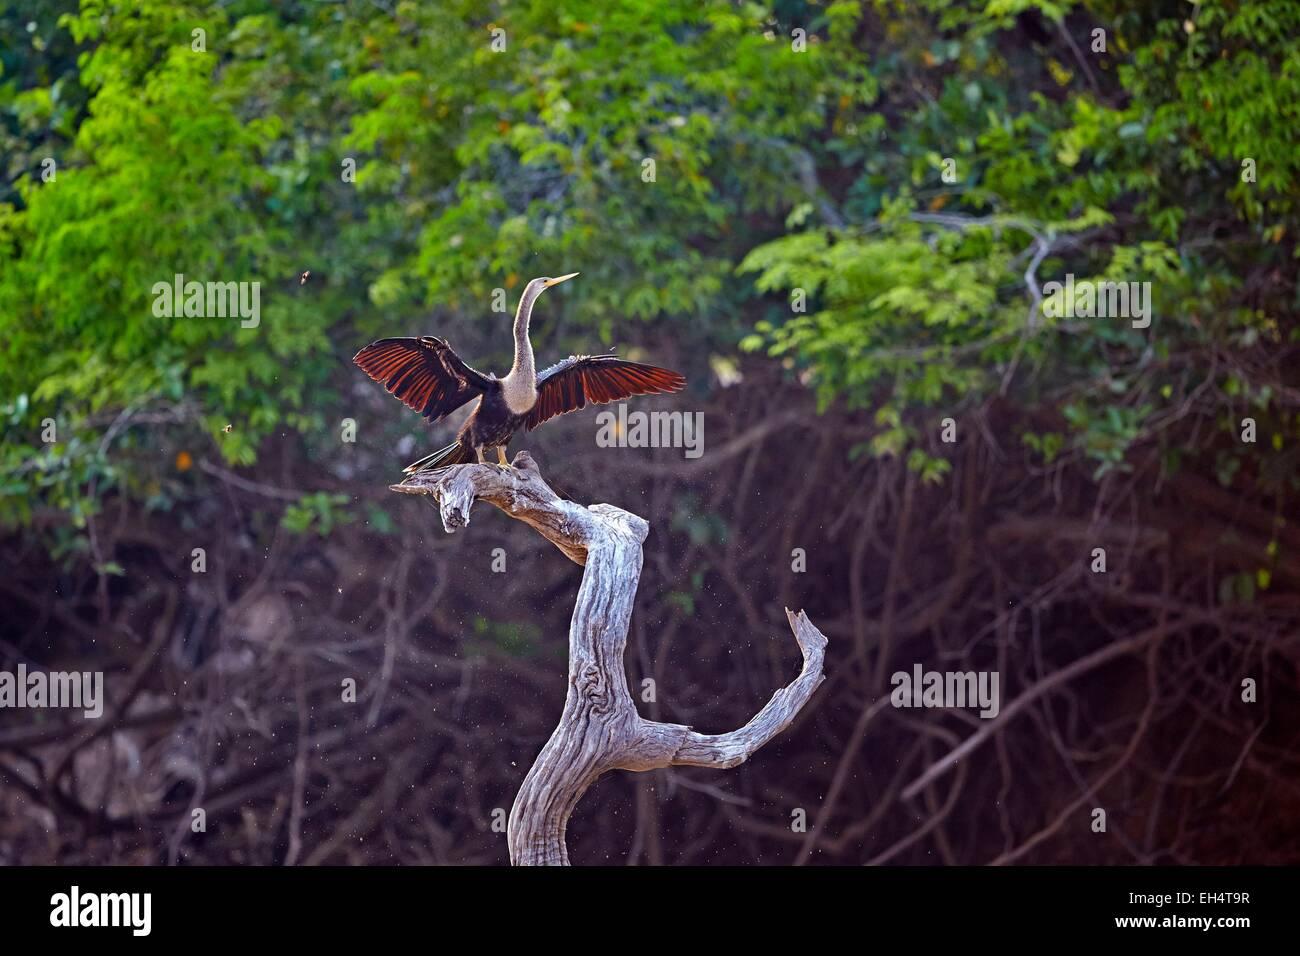 Brazil, Mato Grosso, Pantanal region, Neotropic Cormorant or Olivaceous Cormorant (Phalacrocorax brasilianus or - Stock Image